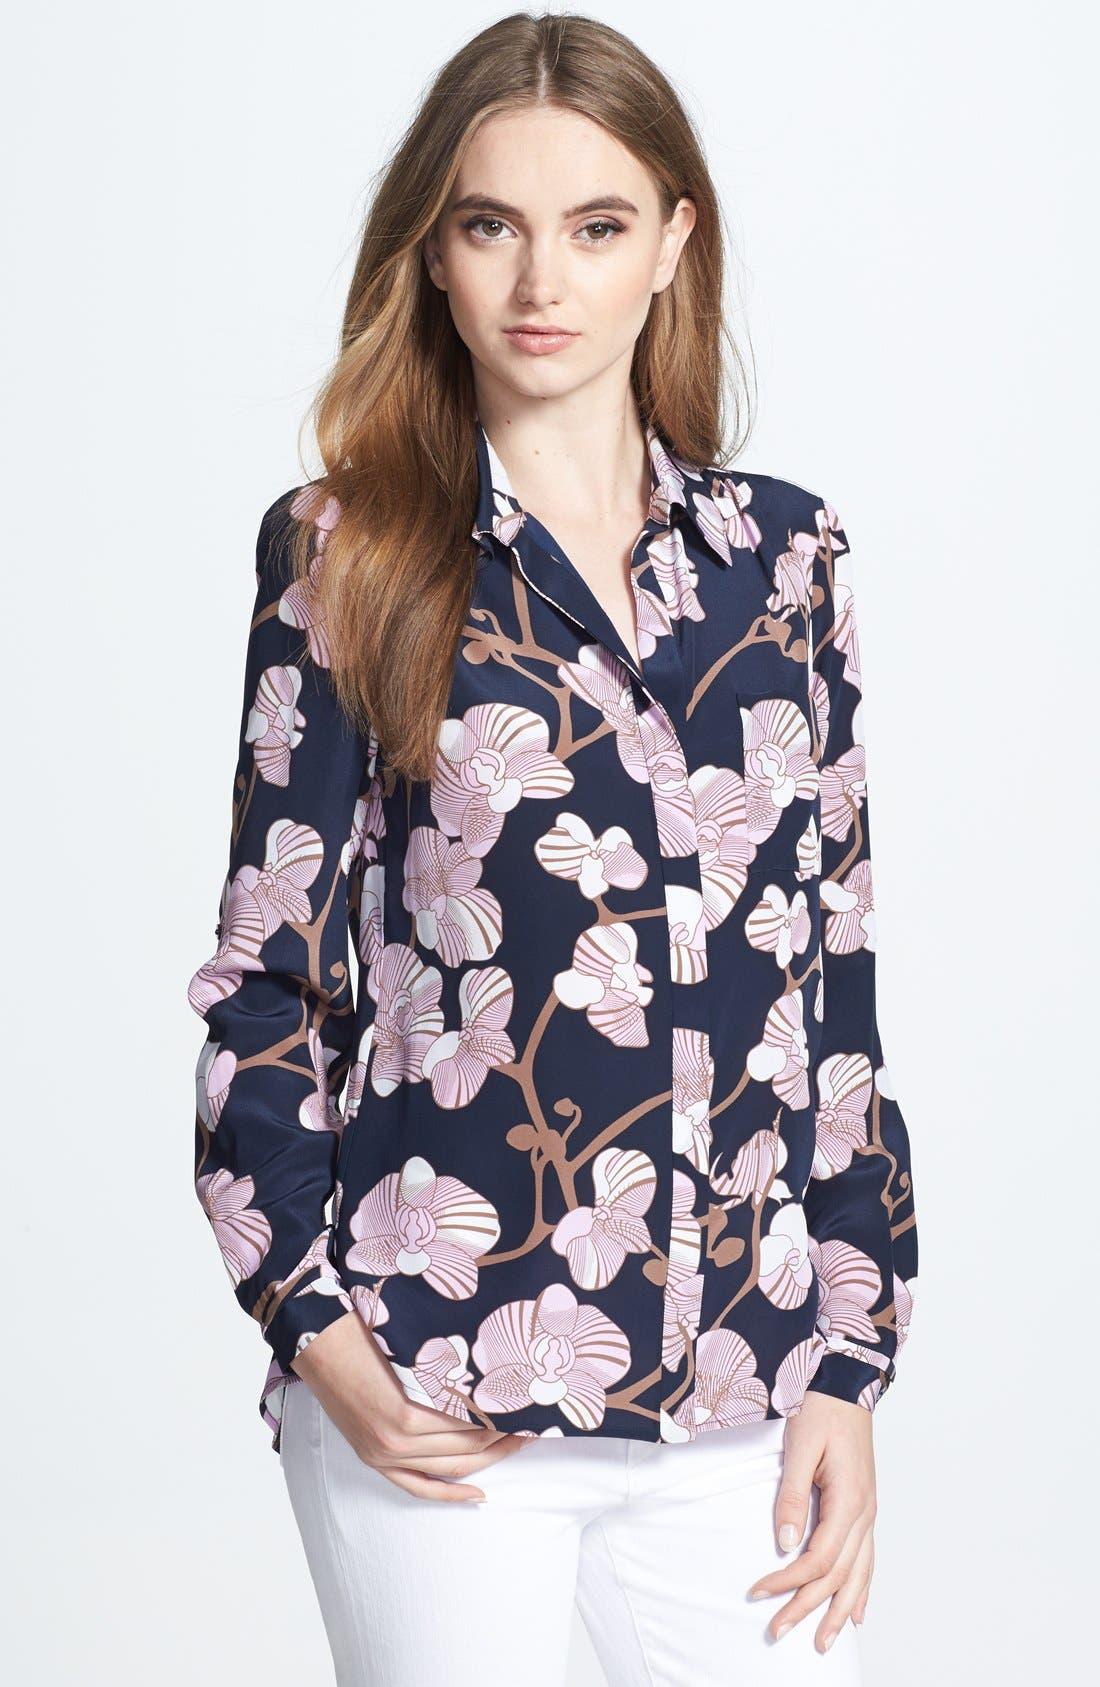 Alternate Image 1 Selected - Diane von Furstenberg 'Lorelei 2' Print Silk Shirt